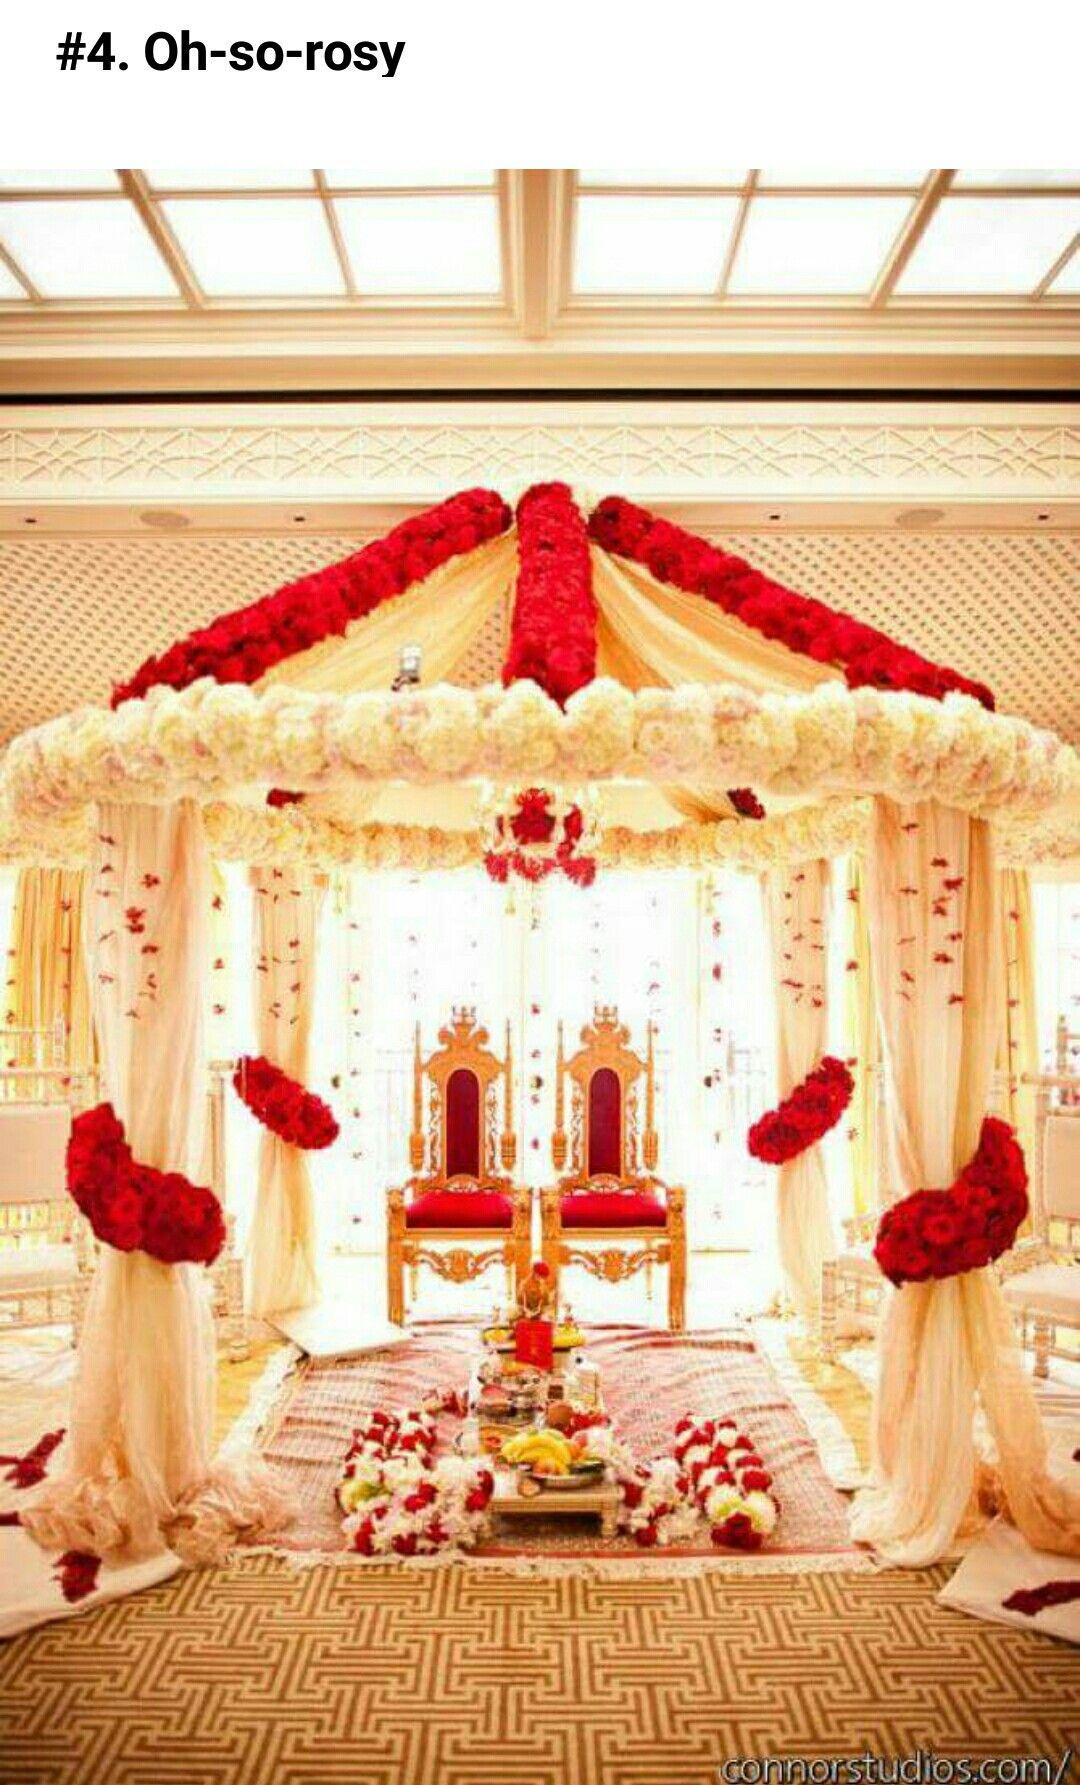 Pin by Harshita Laddha on wedding decor❤ | Pinterest | Engagement ...